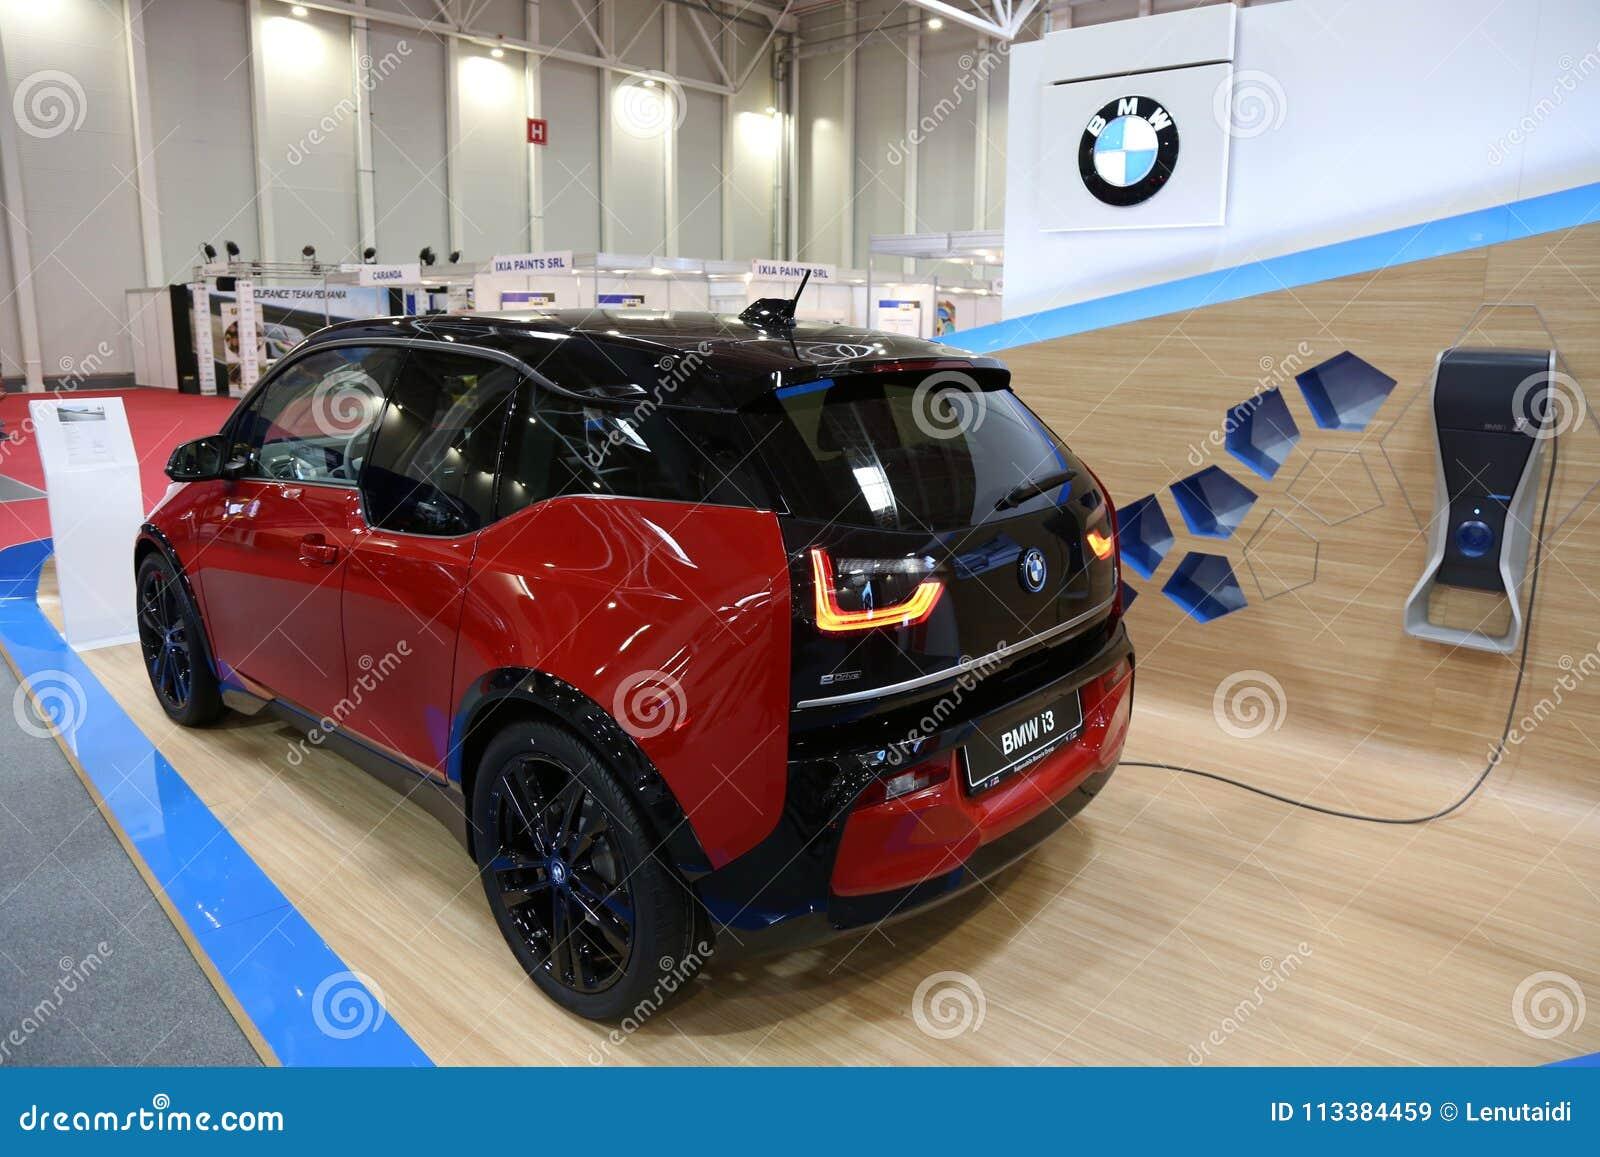 BMW i3s elektrisch an SIAB 2018, Romexpo, Bukarest, Rumänien